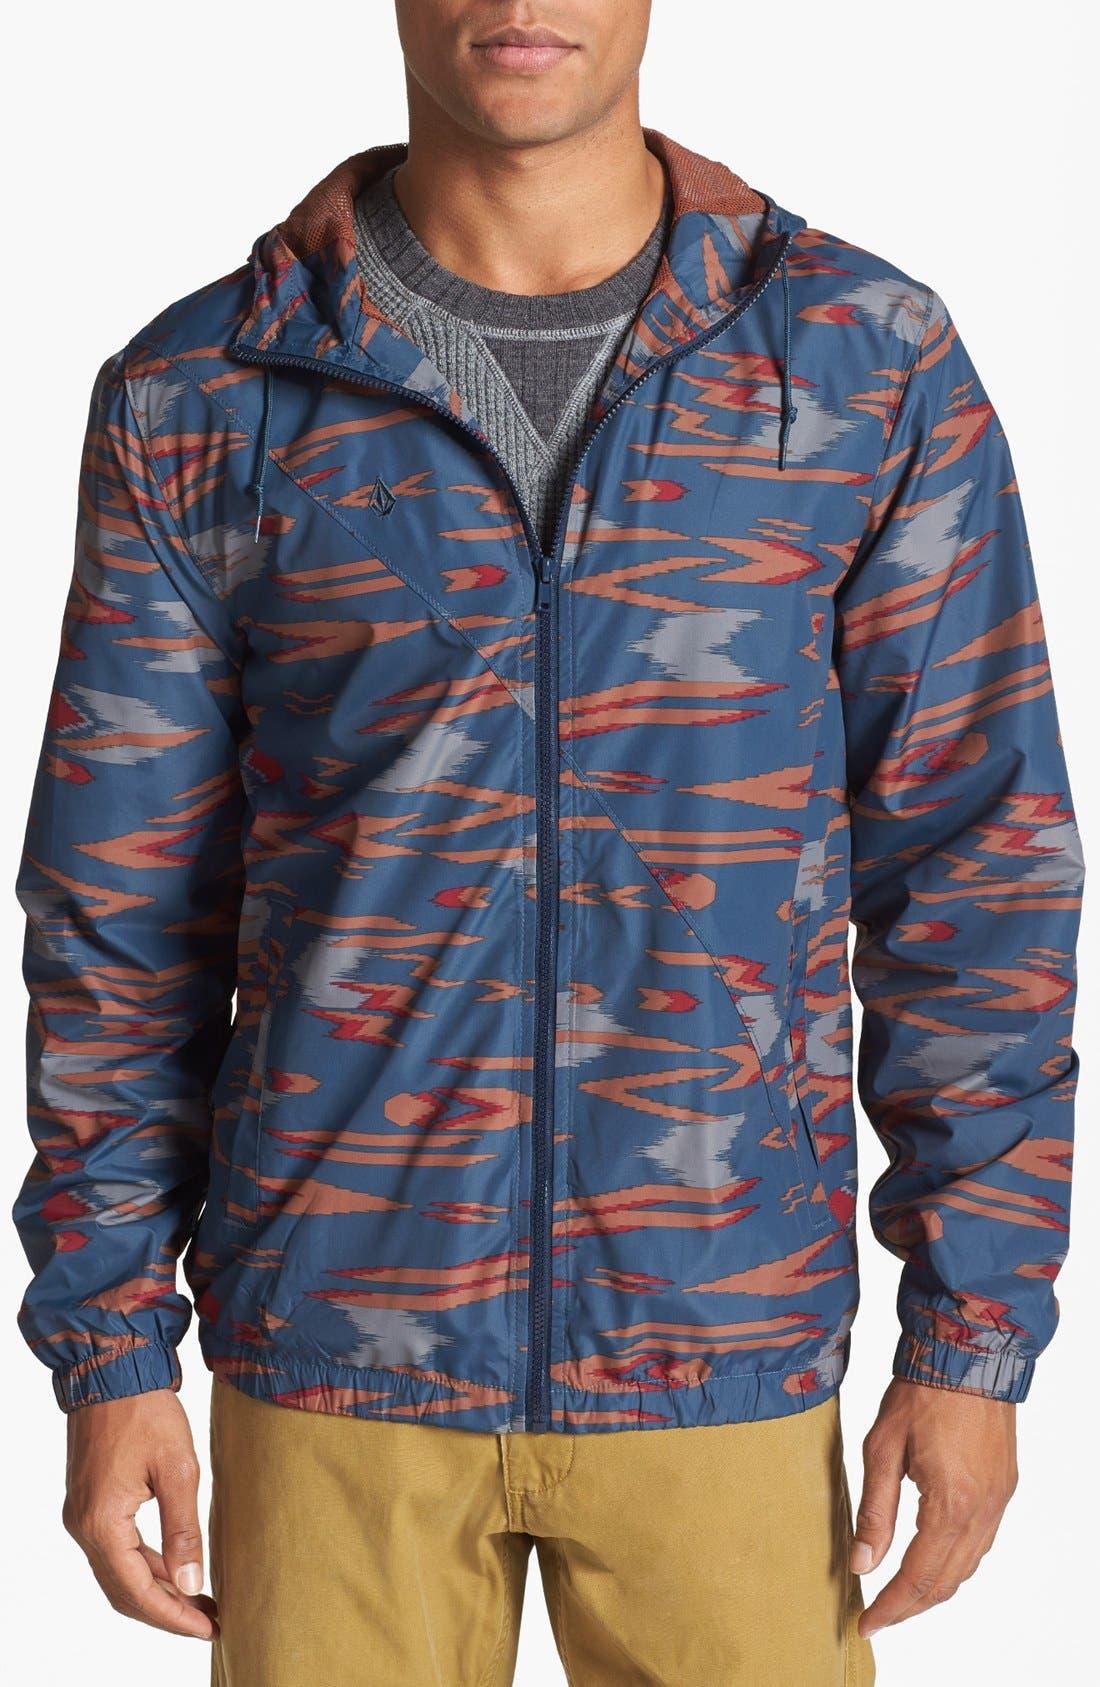 Main Image - Volcom 'Forwarder' Windbreaker Jacket